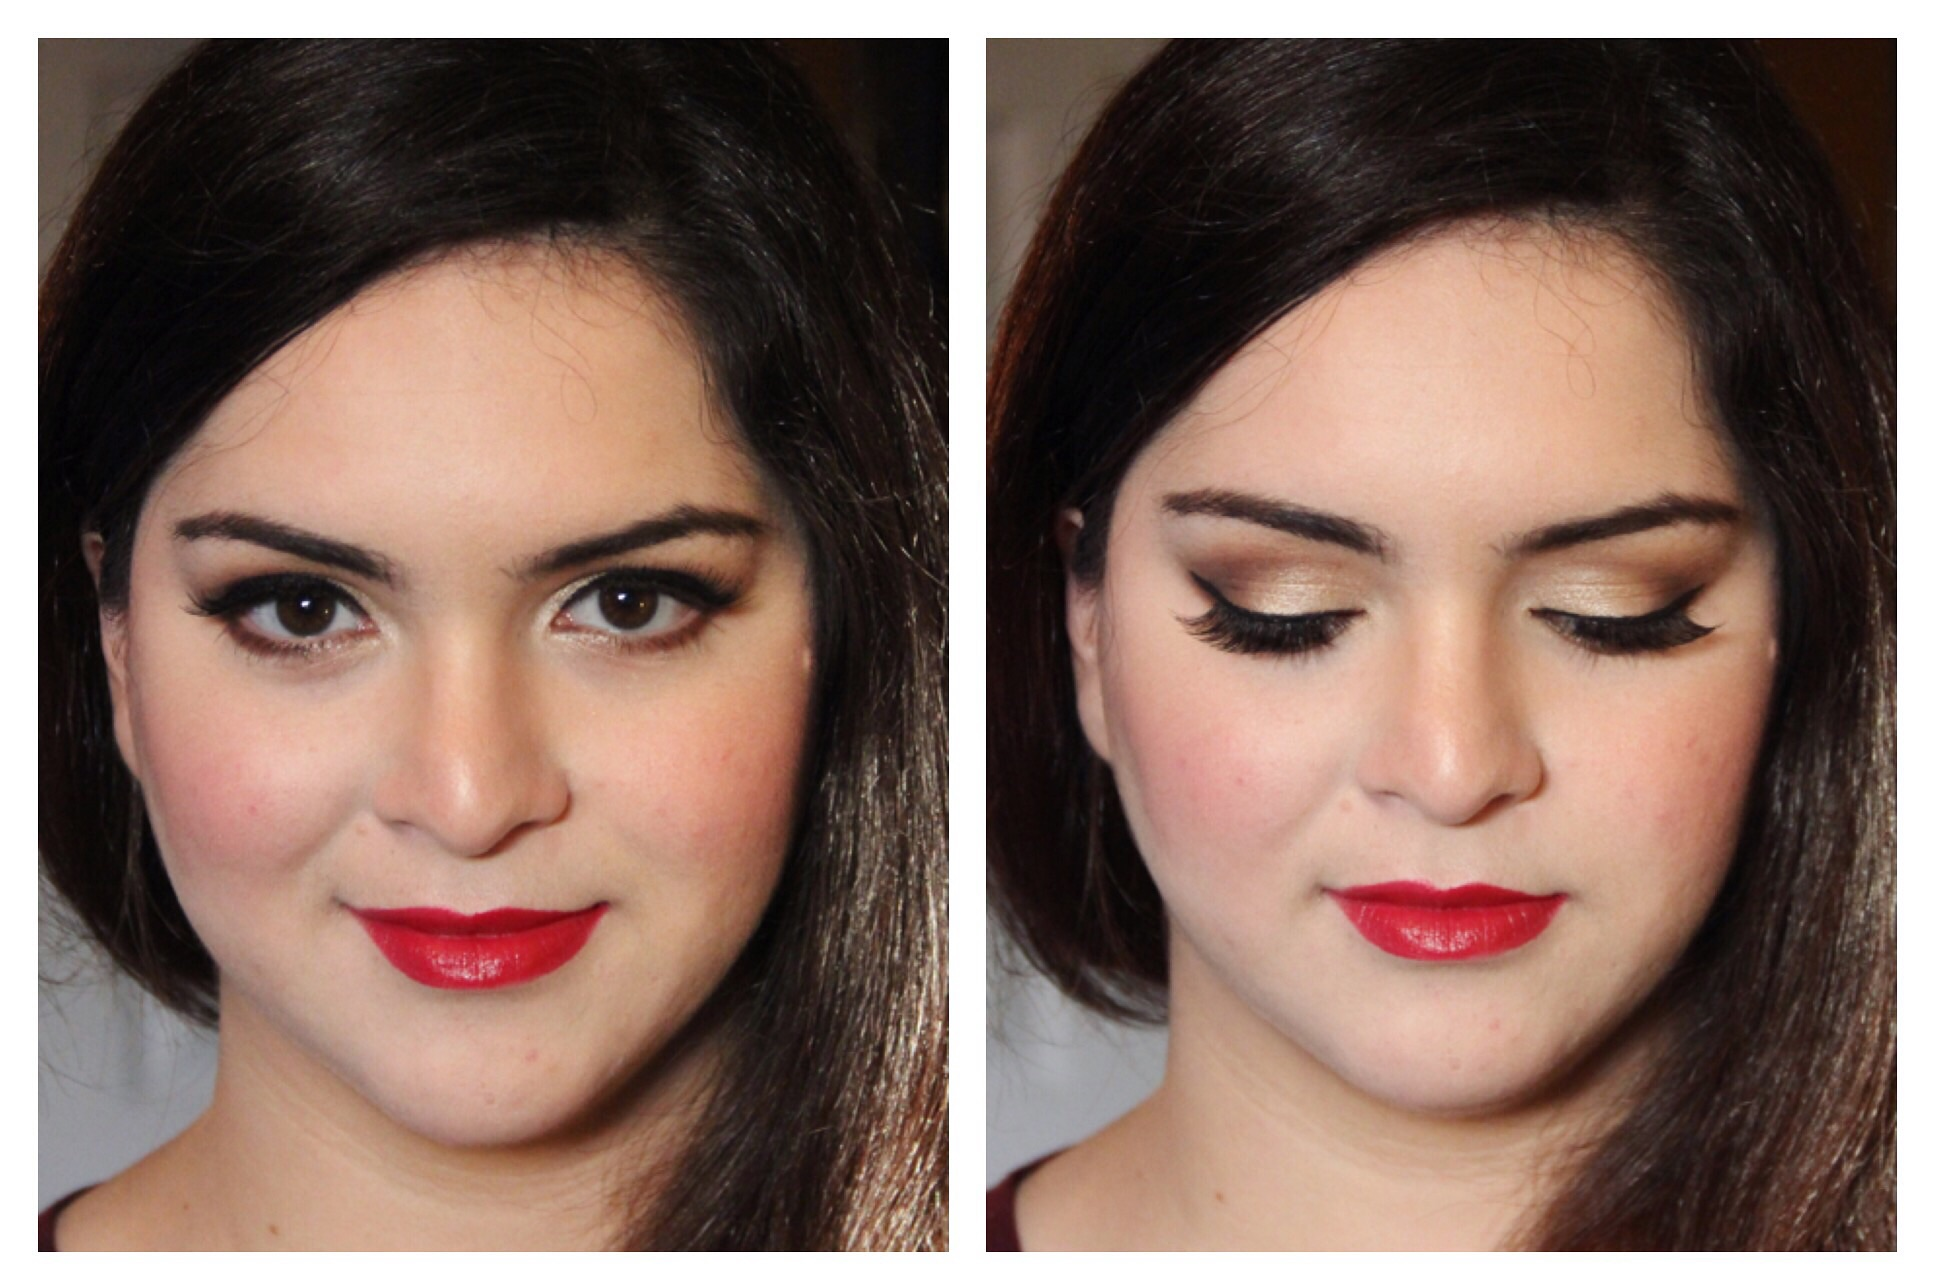 Makeup Artist Pro Group Blog Makeup Artist Pro Group